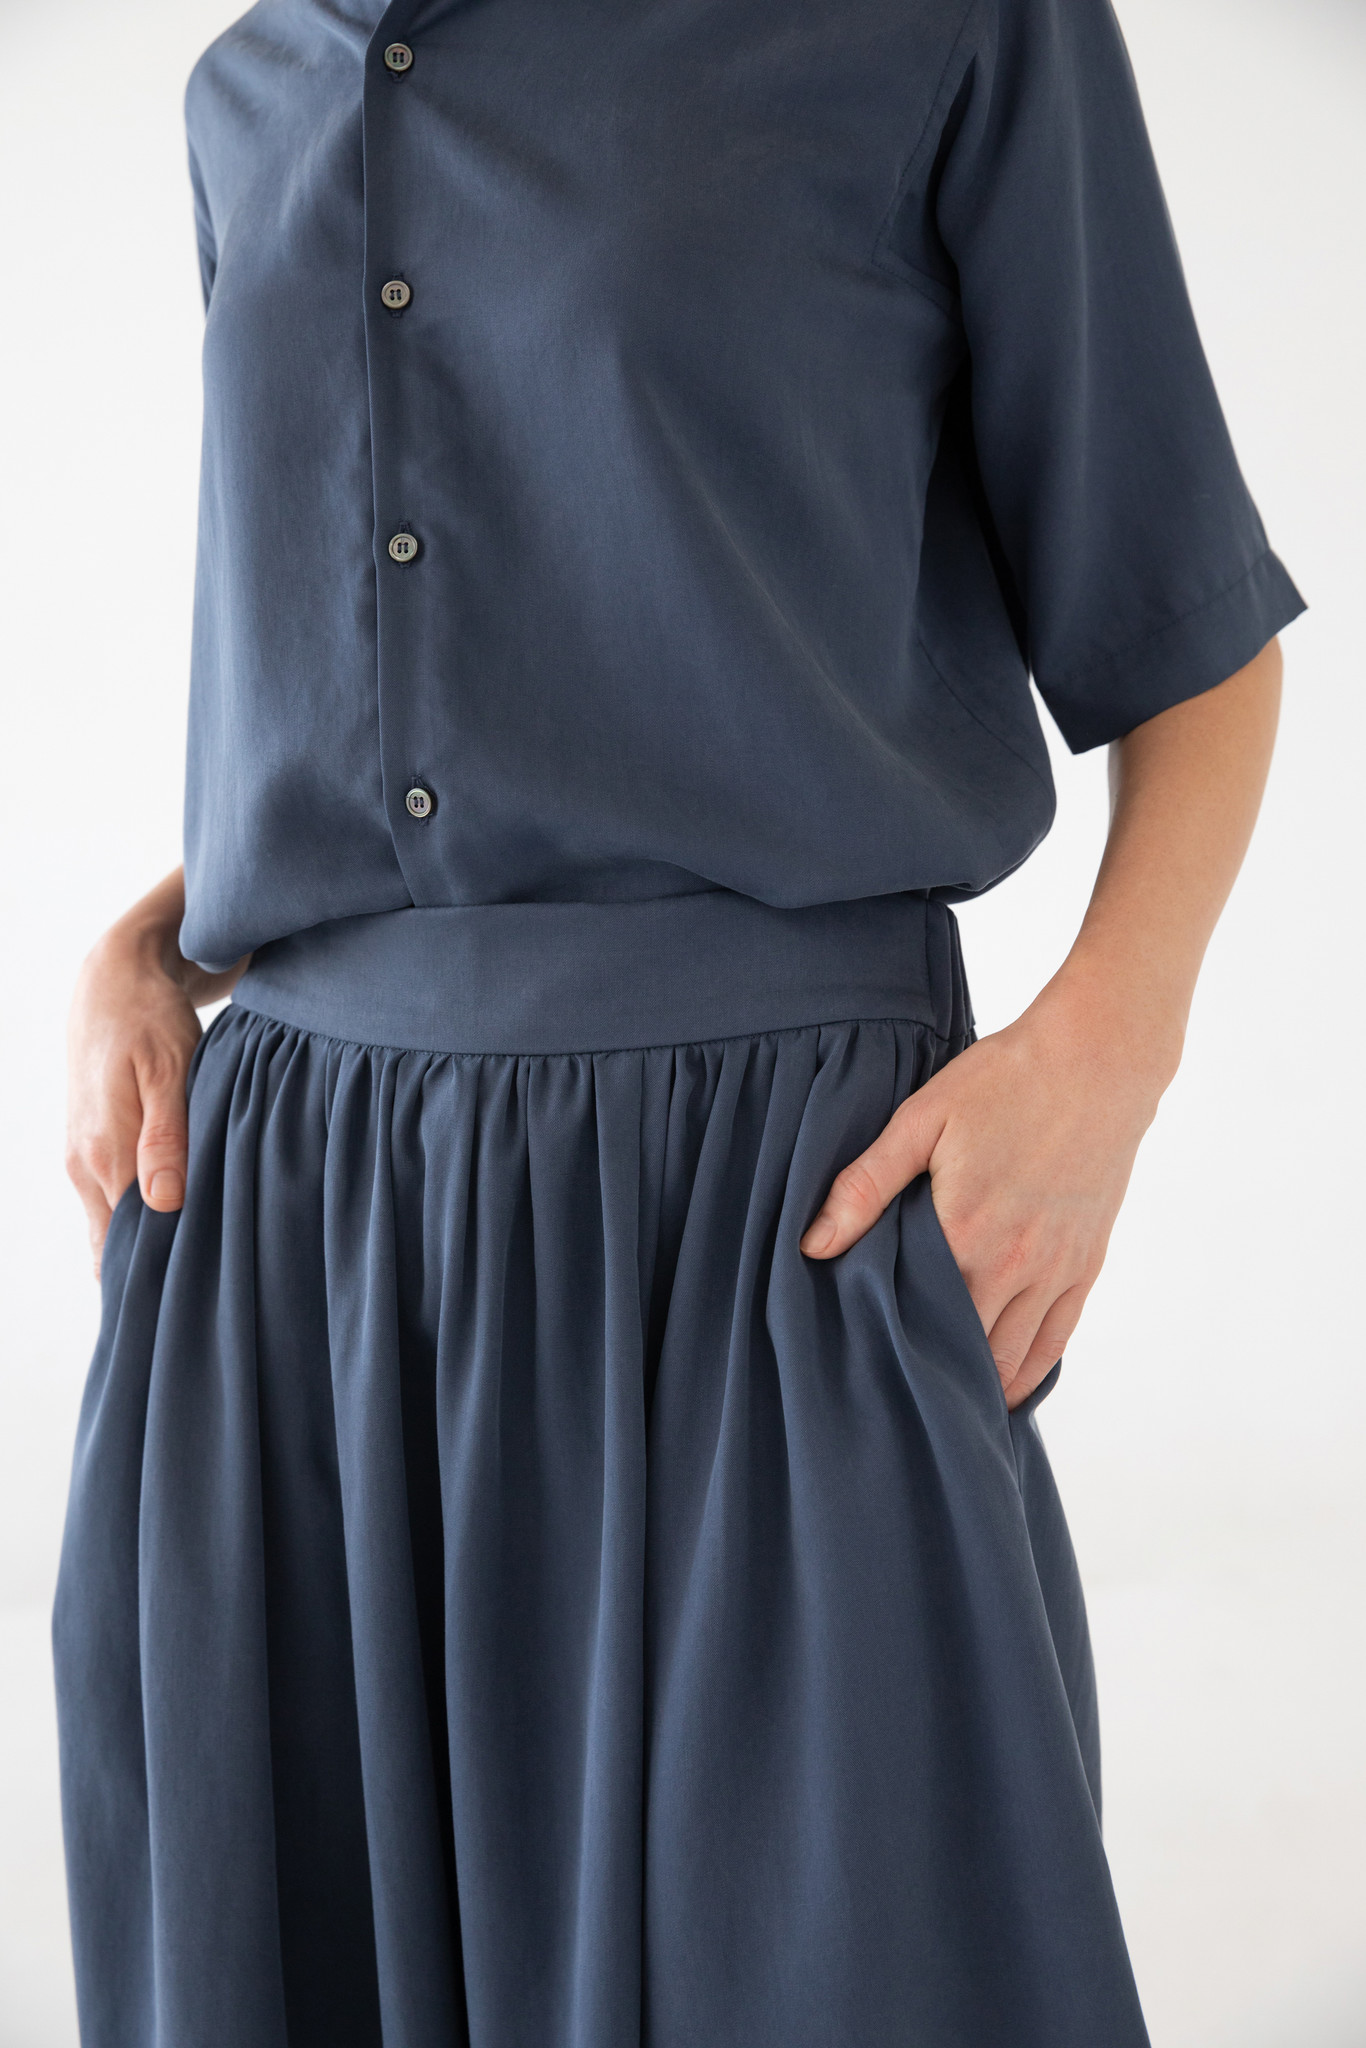 Bluse mit kurzem Arm aus Tencel - Blau-8